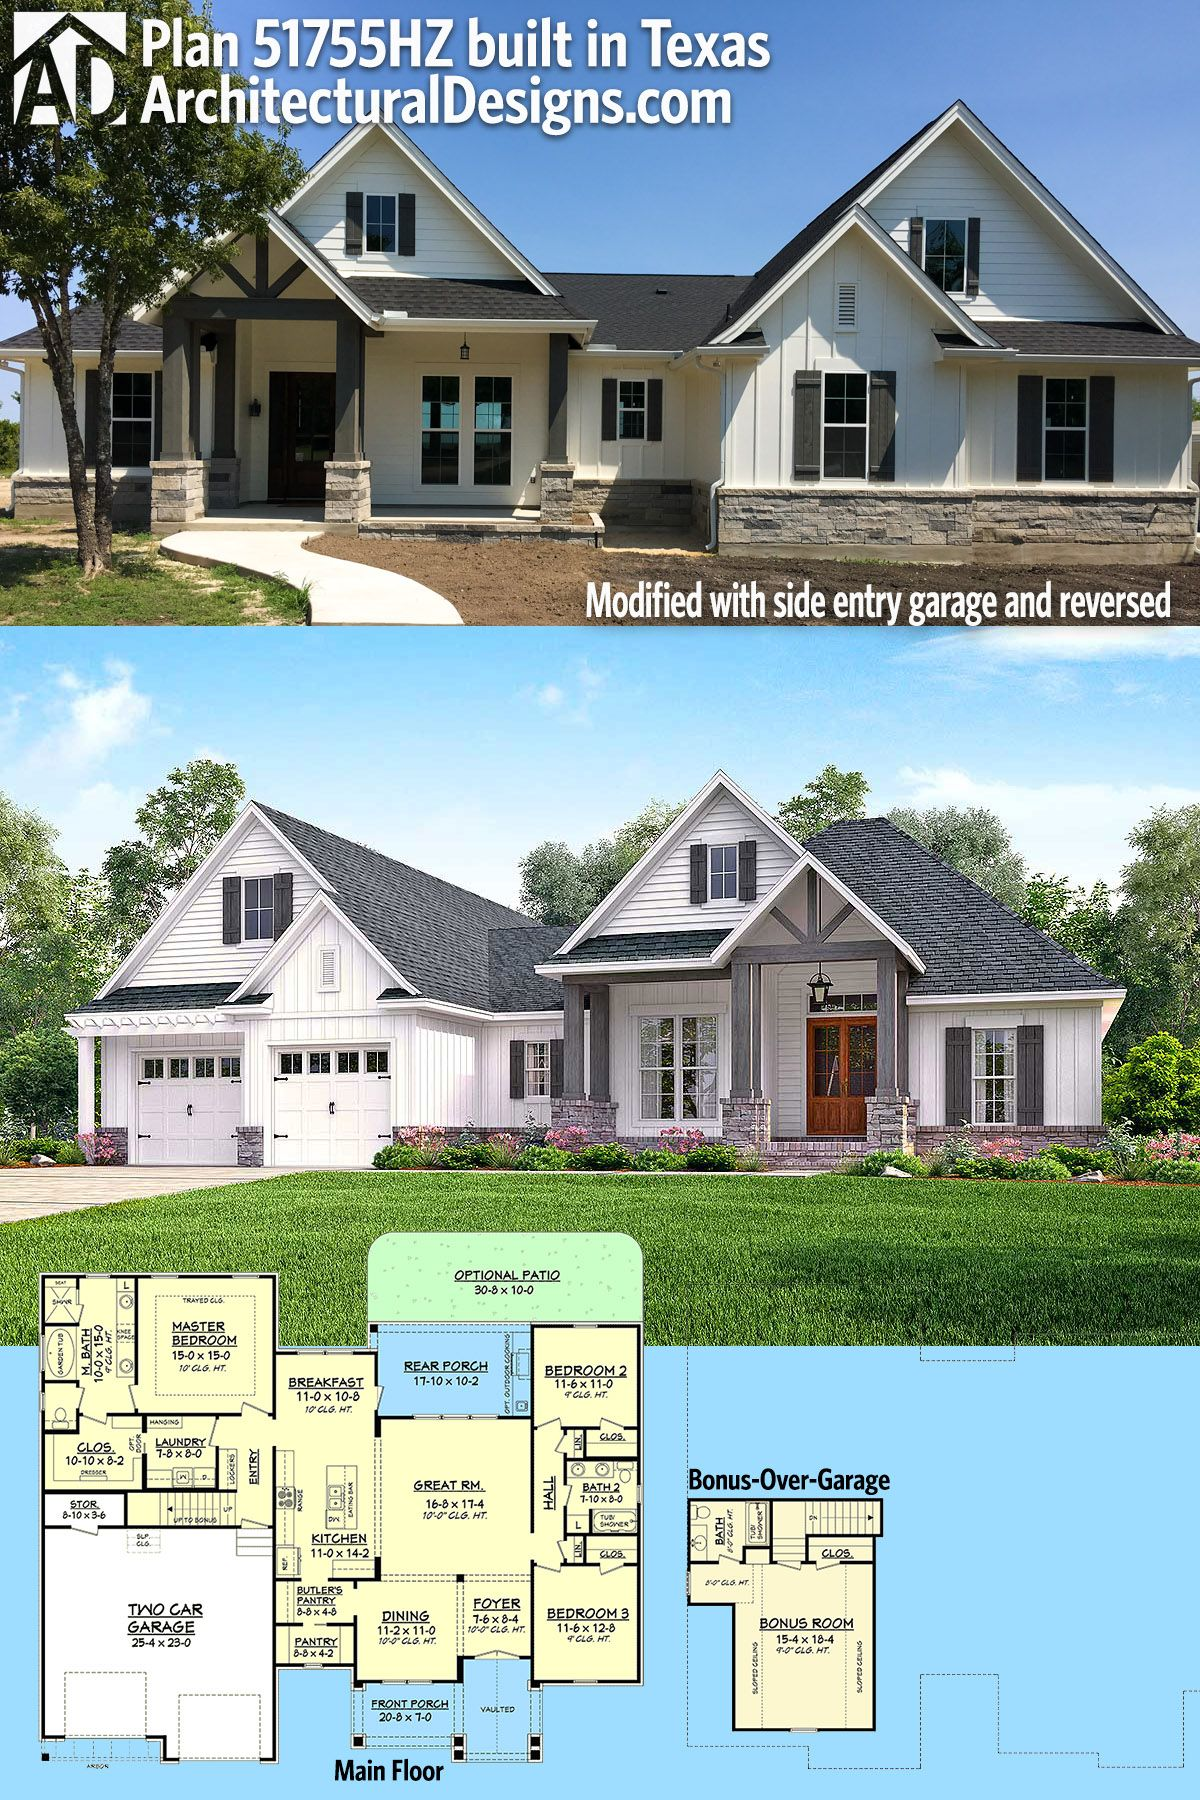 plan 51755hz 3 bed contemporary craftsman with bonus over garage